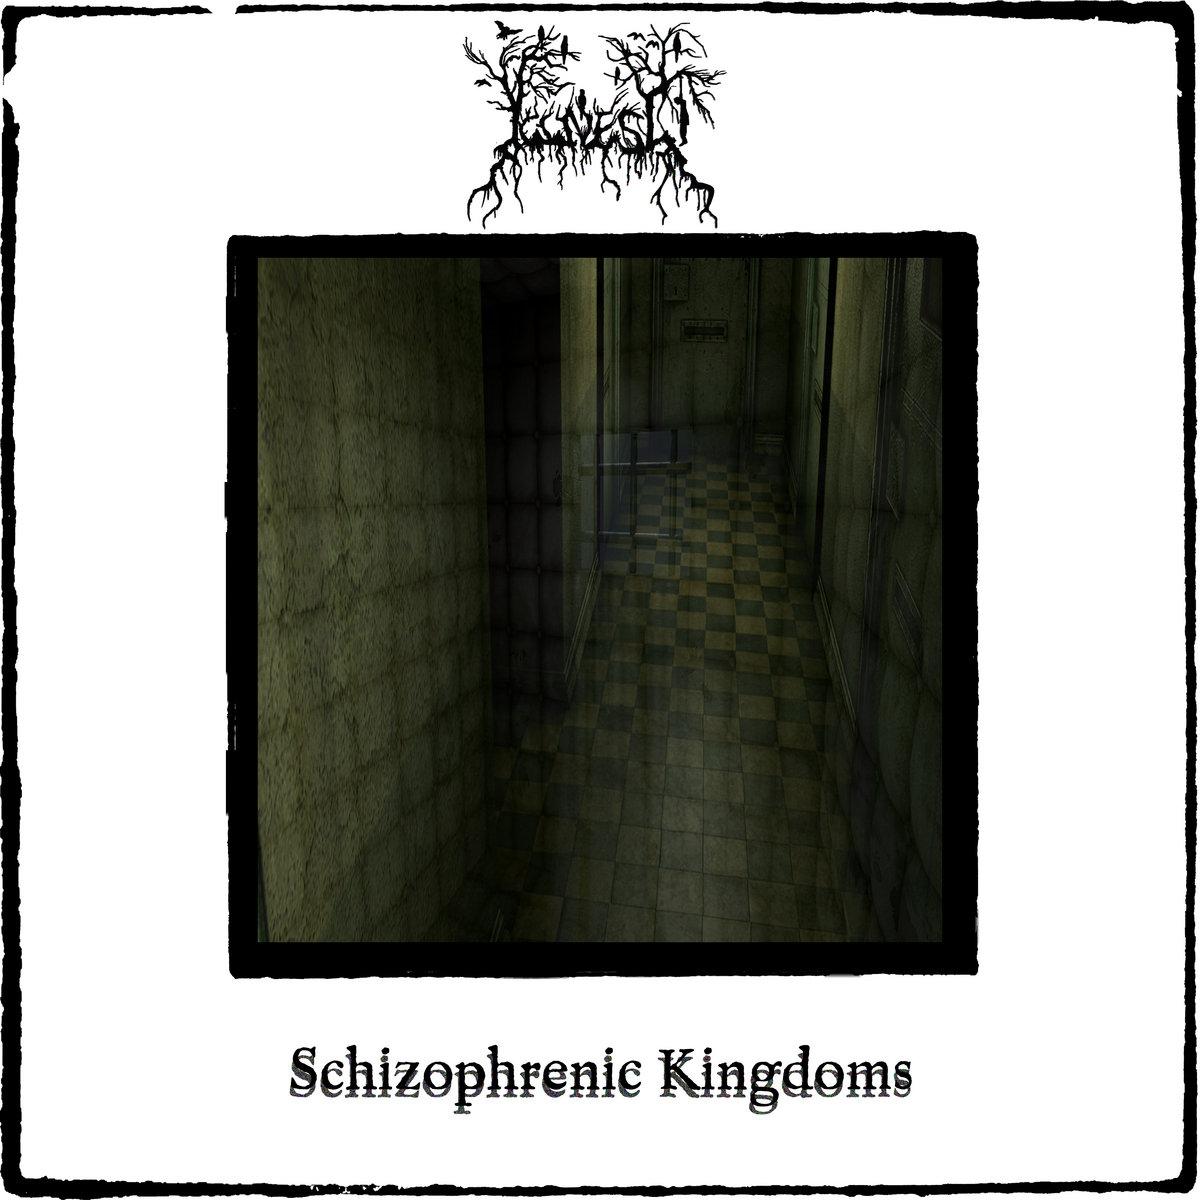 Illness > Schizophrenic Kingdoms